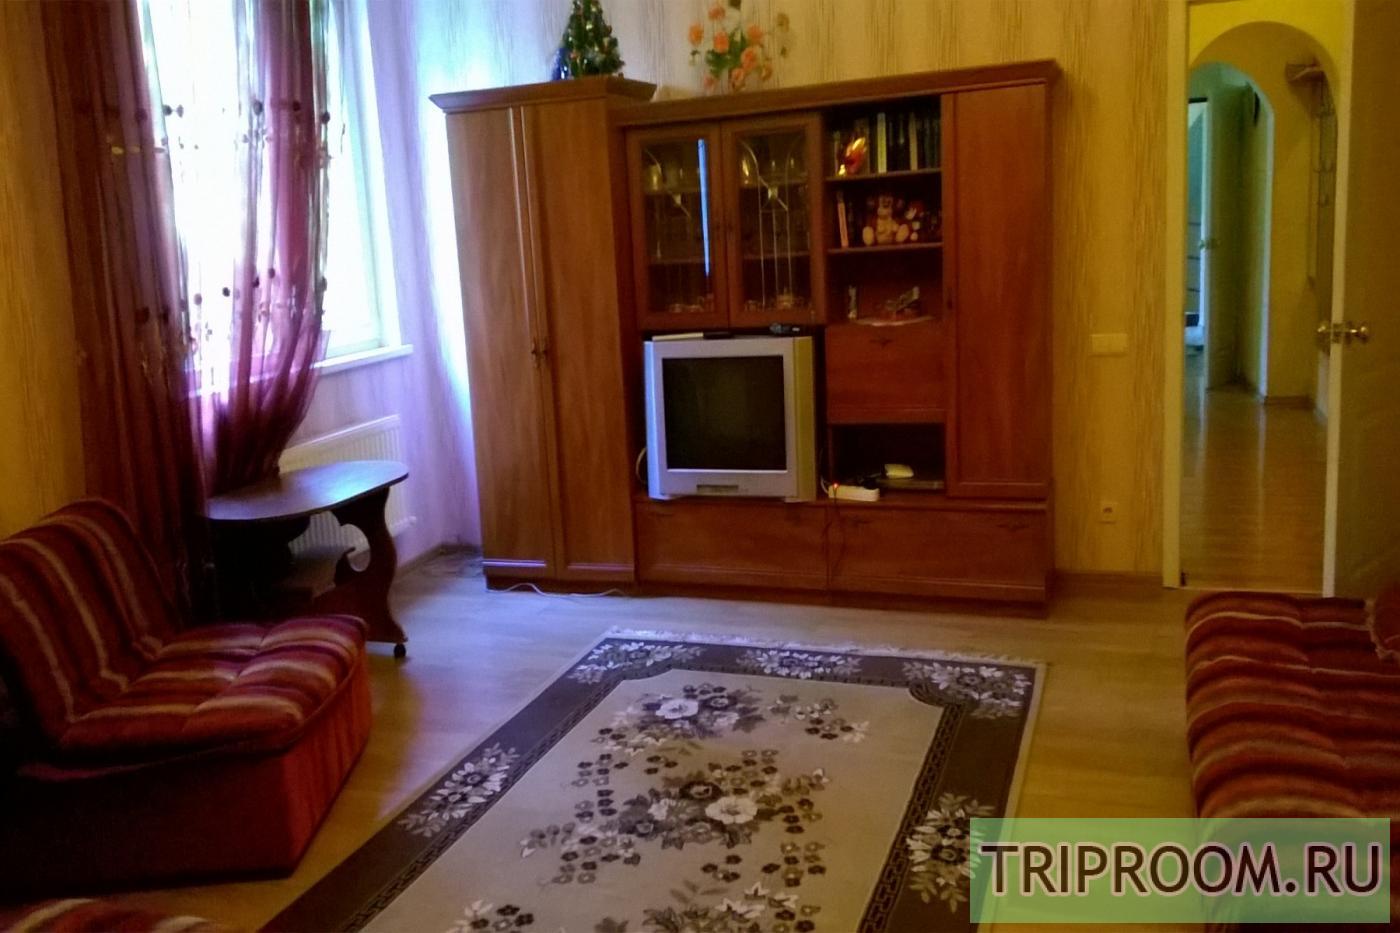 2-комнатная квартира посуточно (вариант № 20368), ул. Свердлова переулок, фото № 3